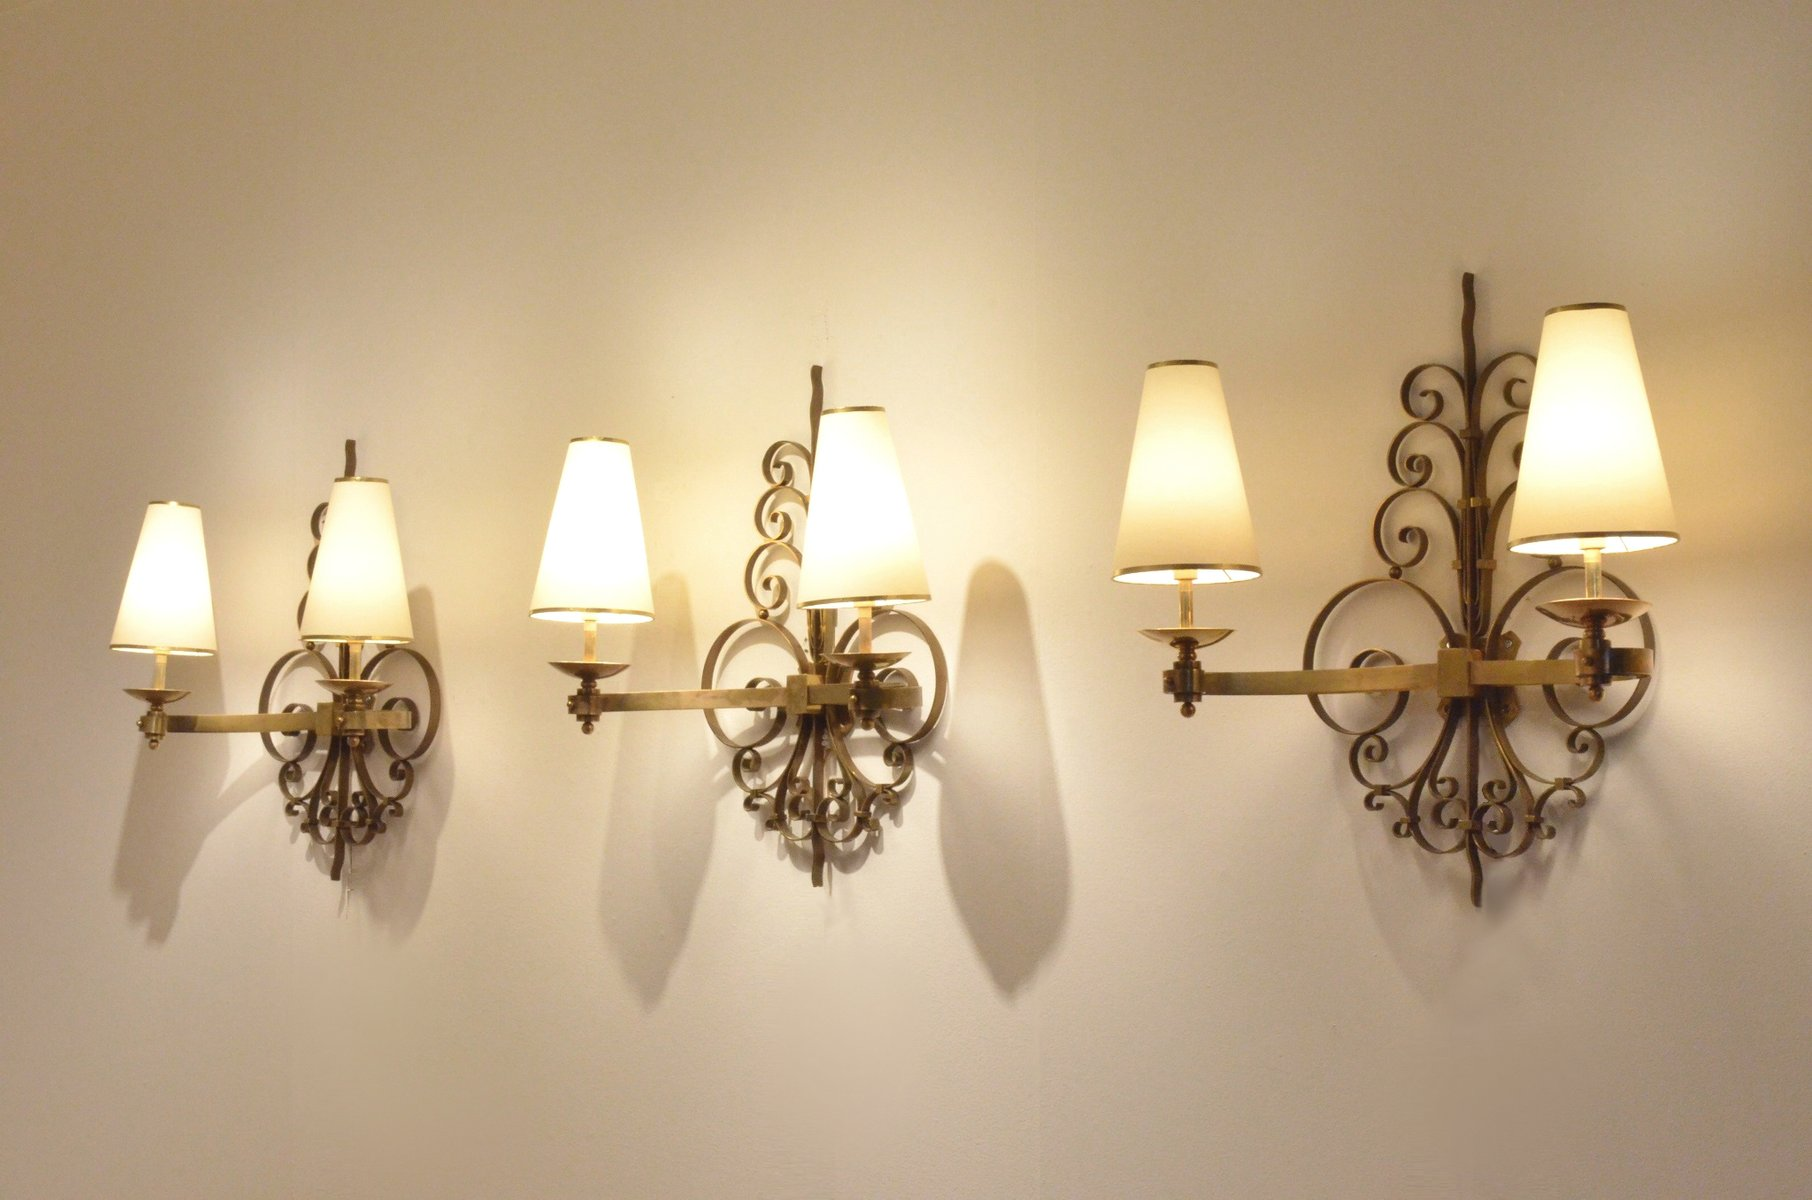 Old Fashioned Art Deco Wall Lights Uk Motif - Art & Wall Decor ...